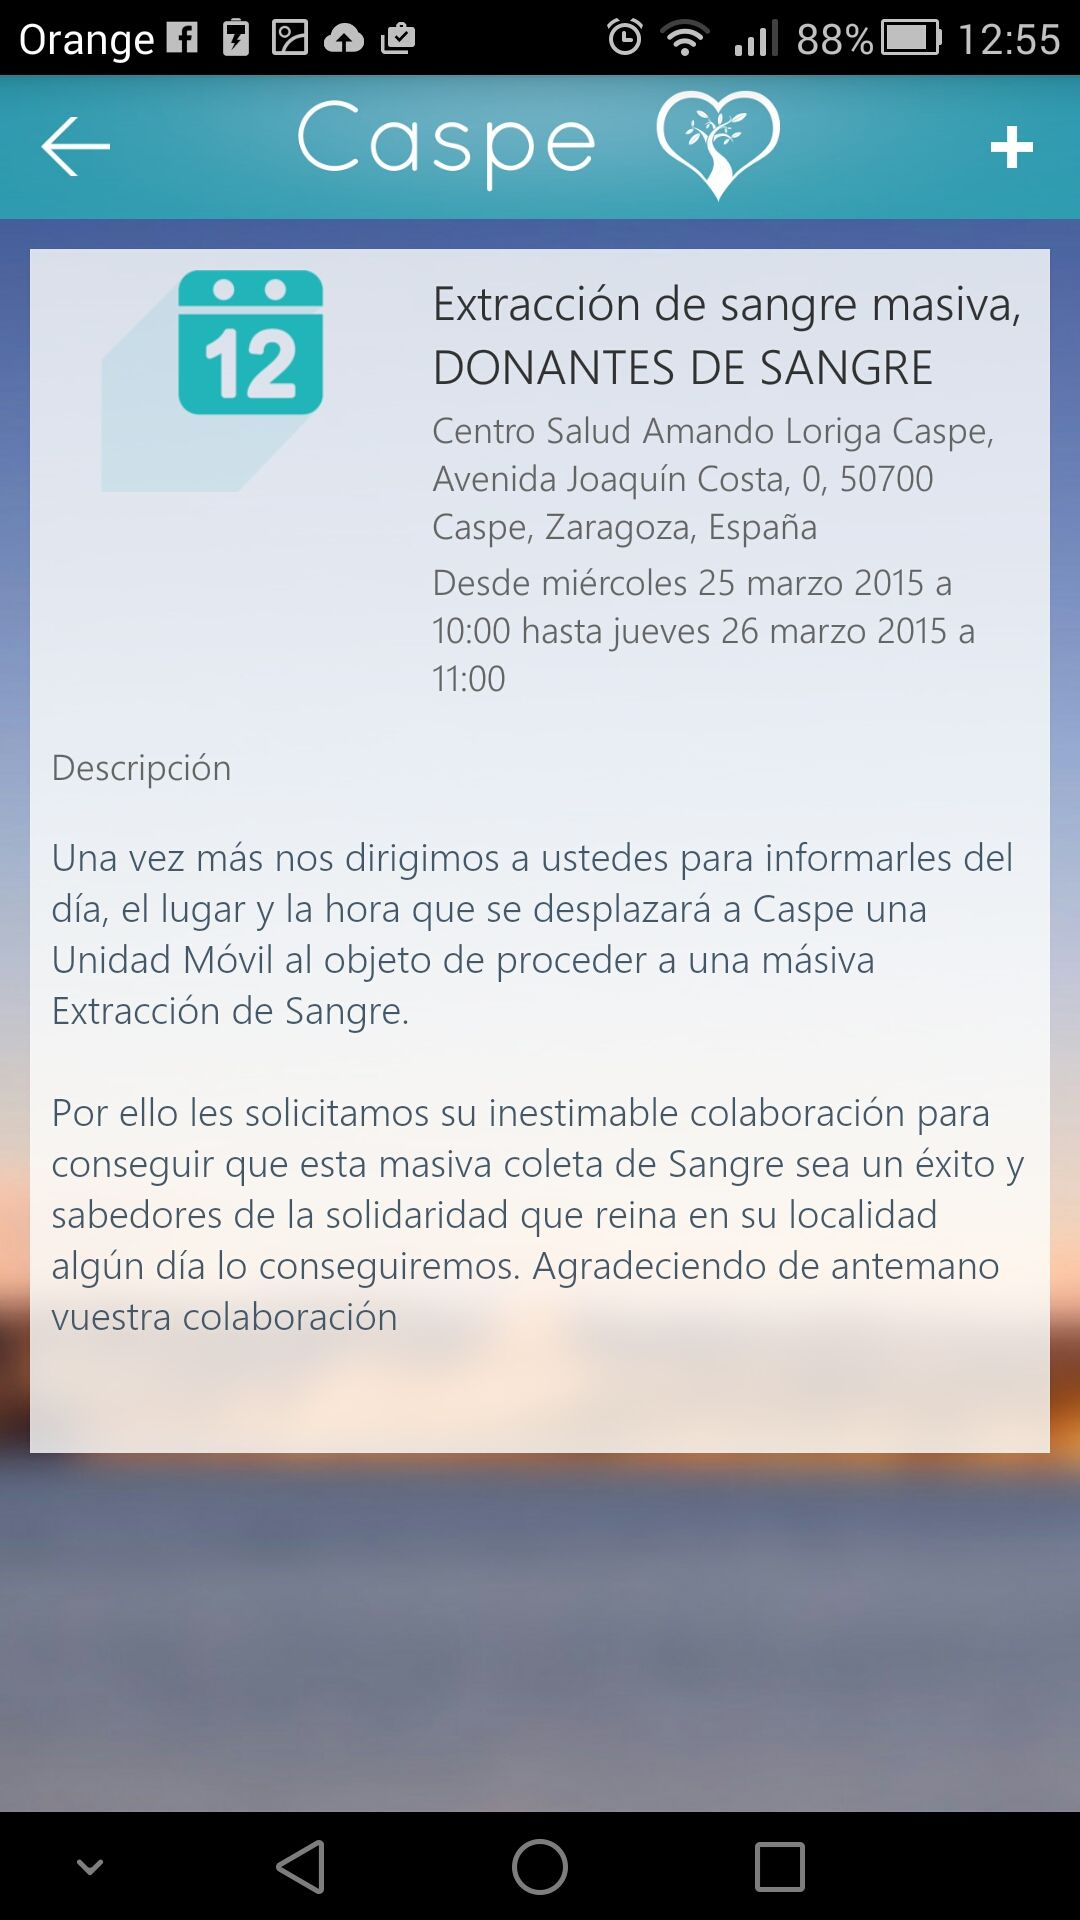 pantallazo_app_caspe_entu_bolsillo_10